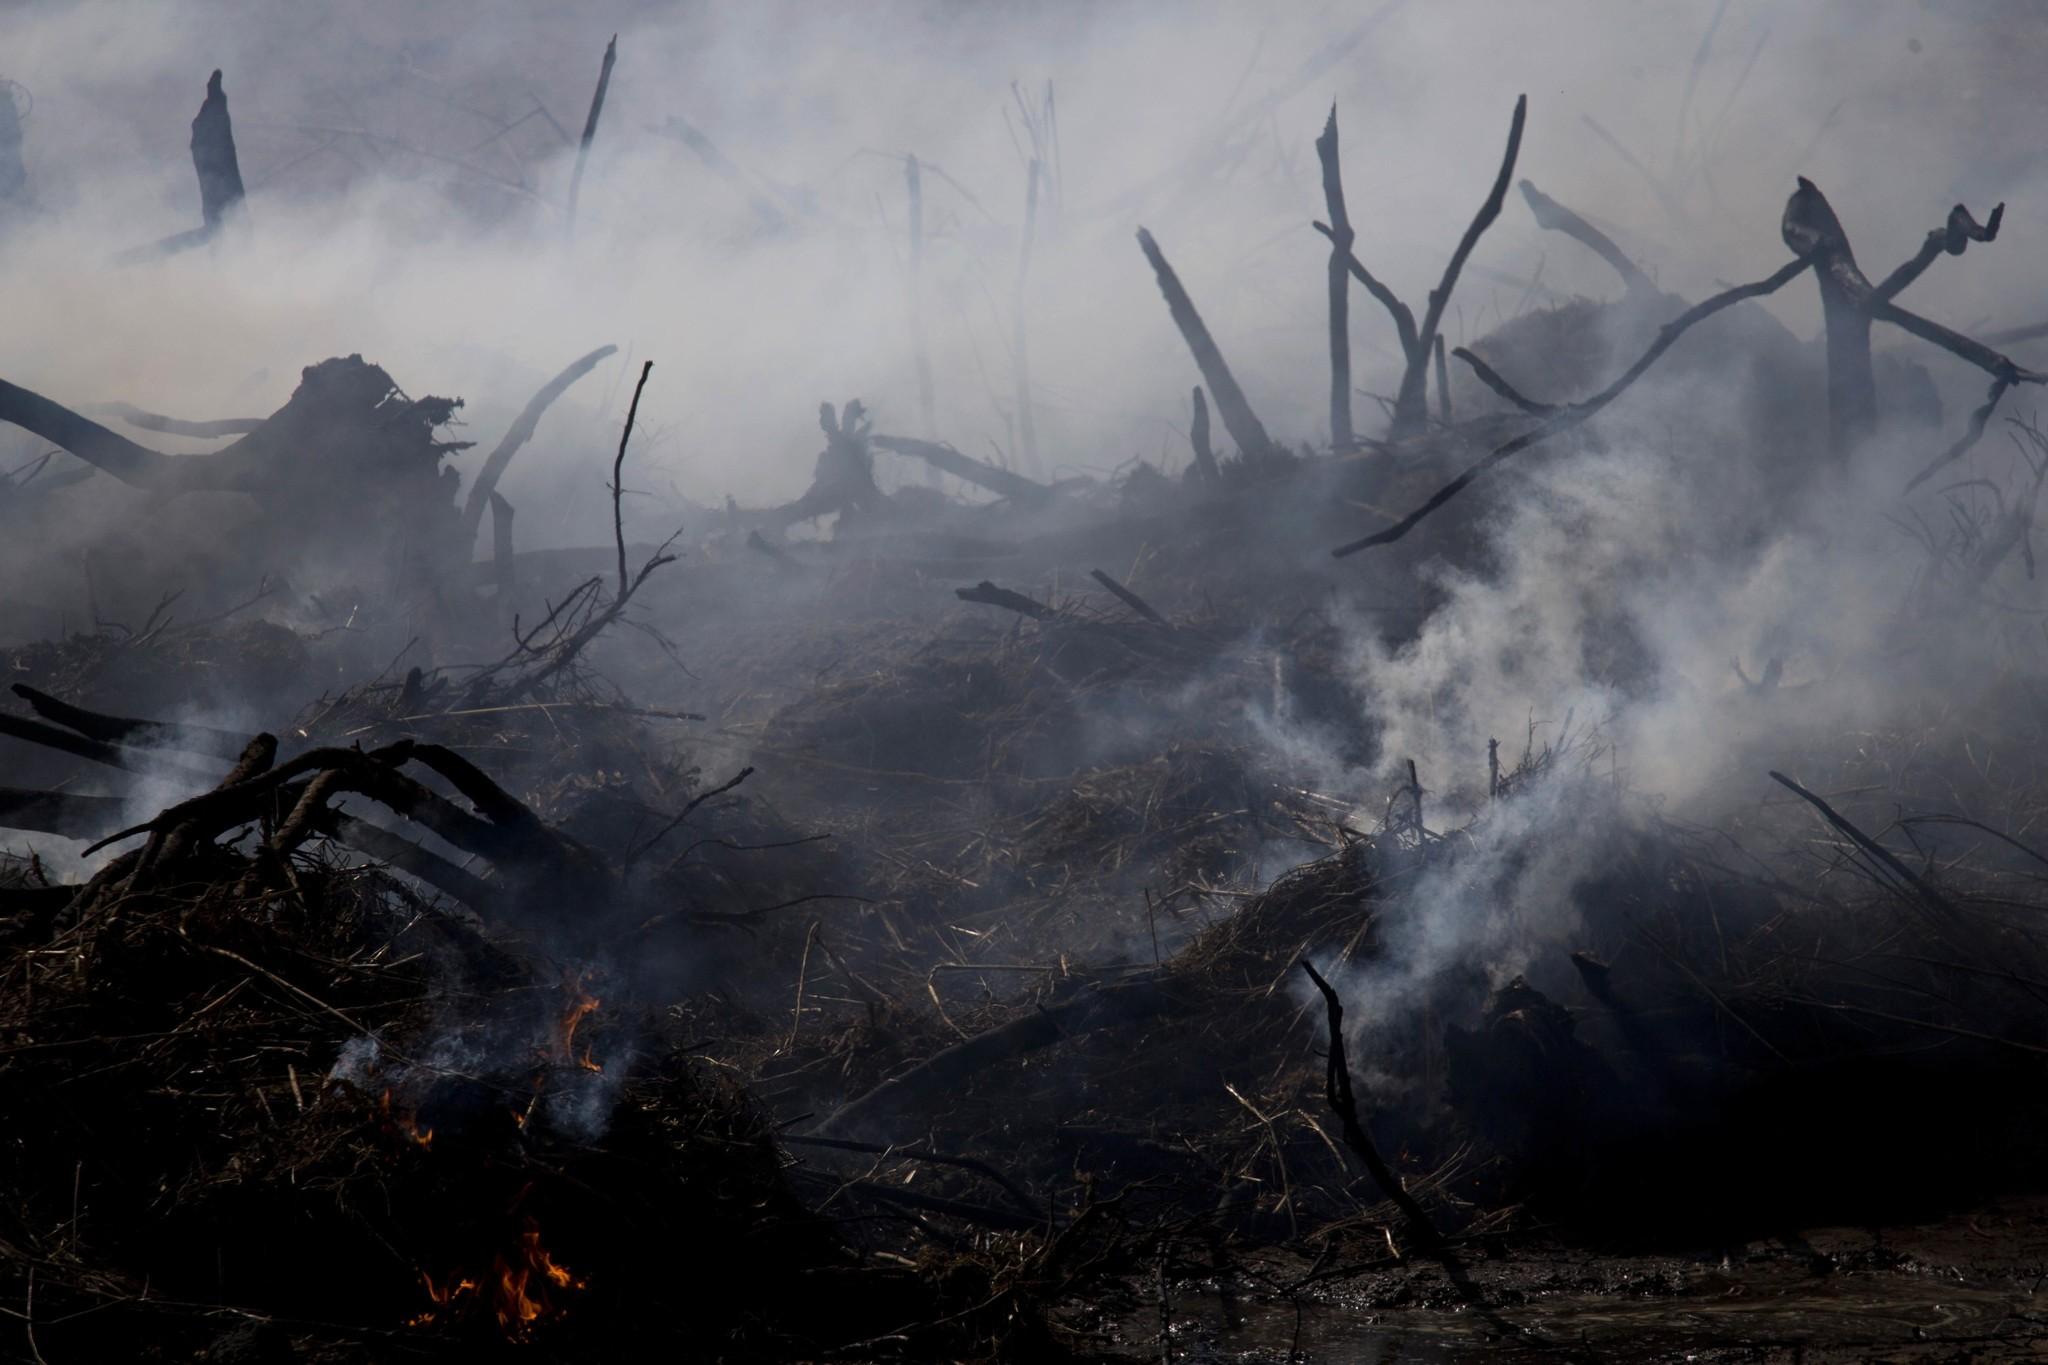 A fire still smolders from a forest fire near Hadera, Israel, Sunday, Nov. 27, 2016. (AP Photo)